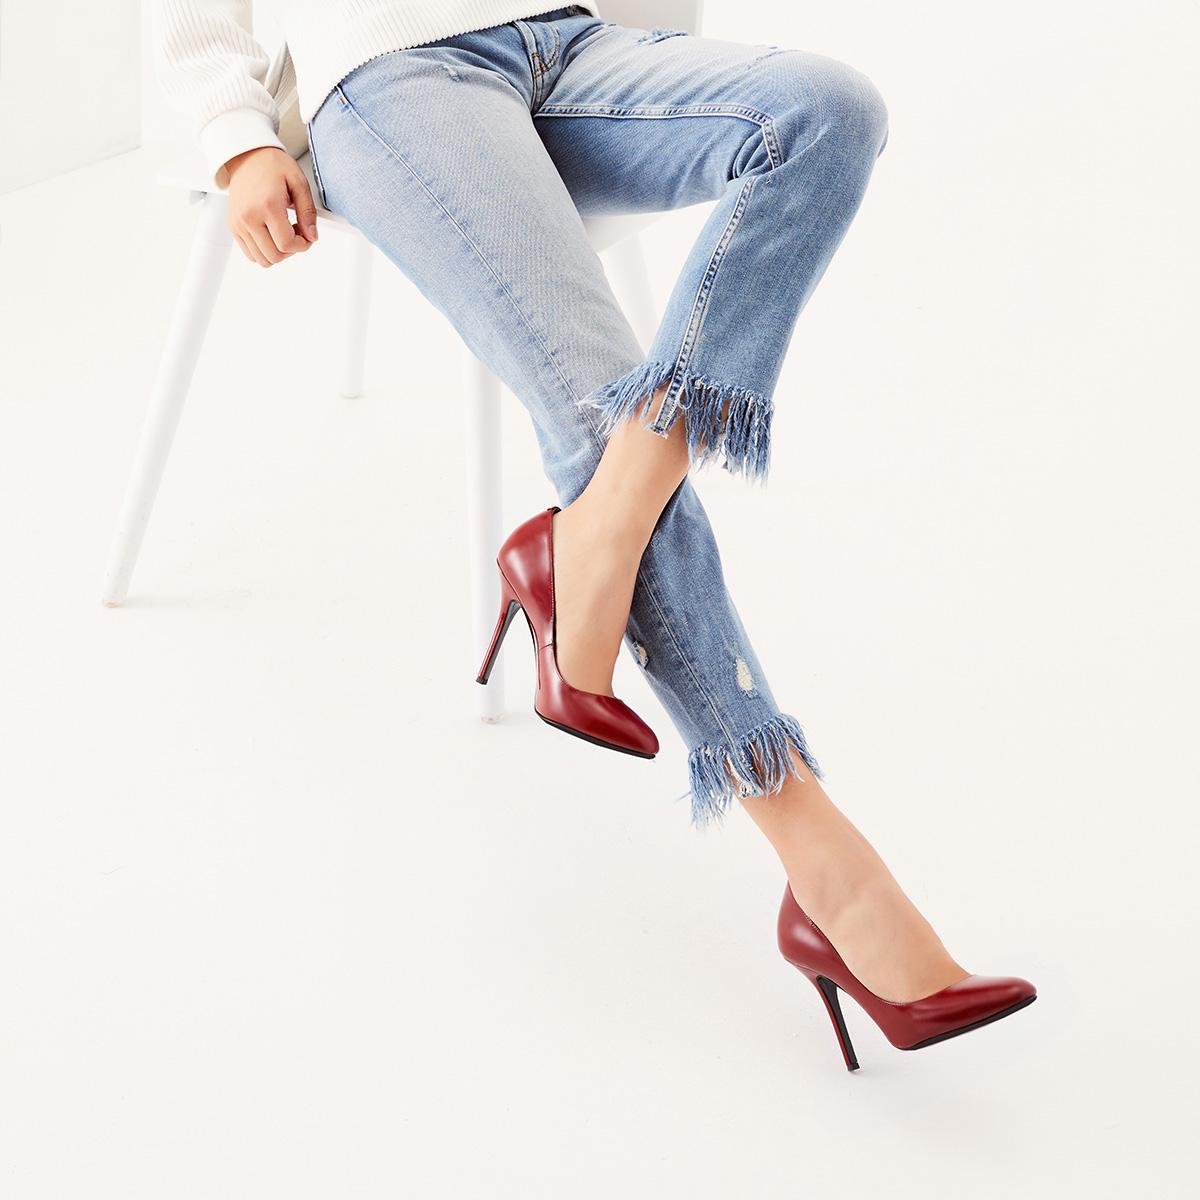 STELLA LUNA尖头浅口细跟女鞋套脚超高跟单鞋SF333L01504-